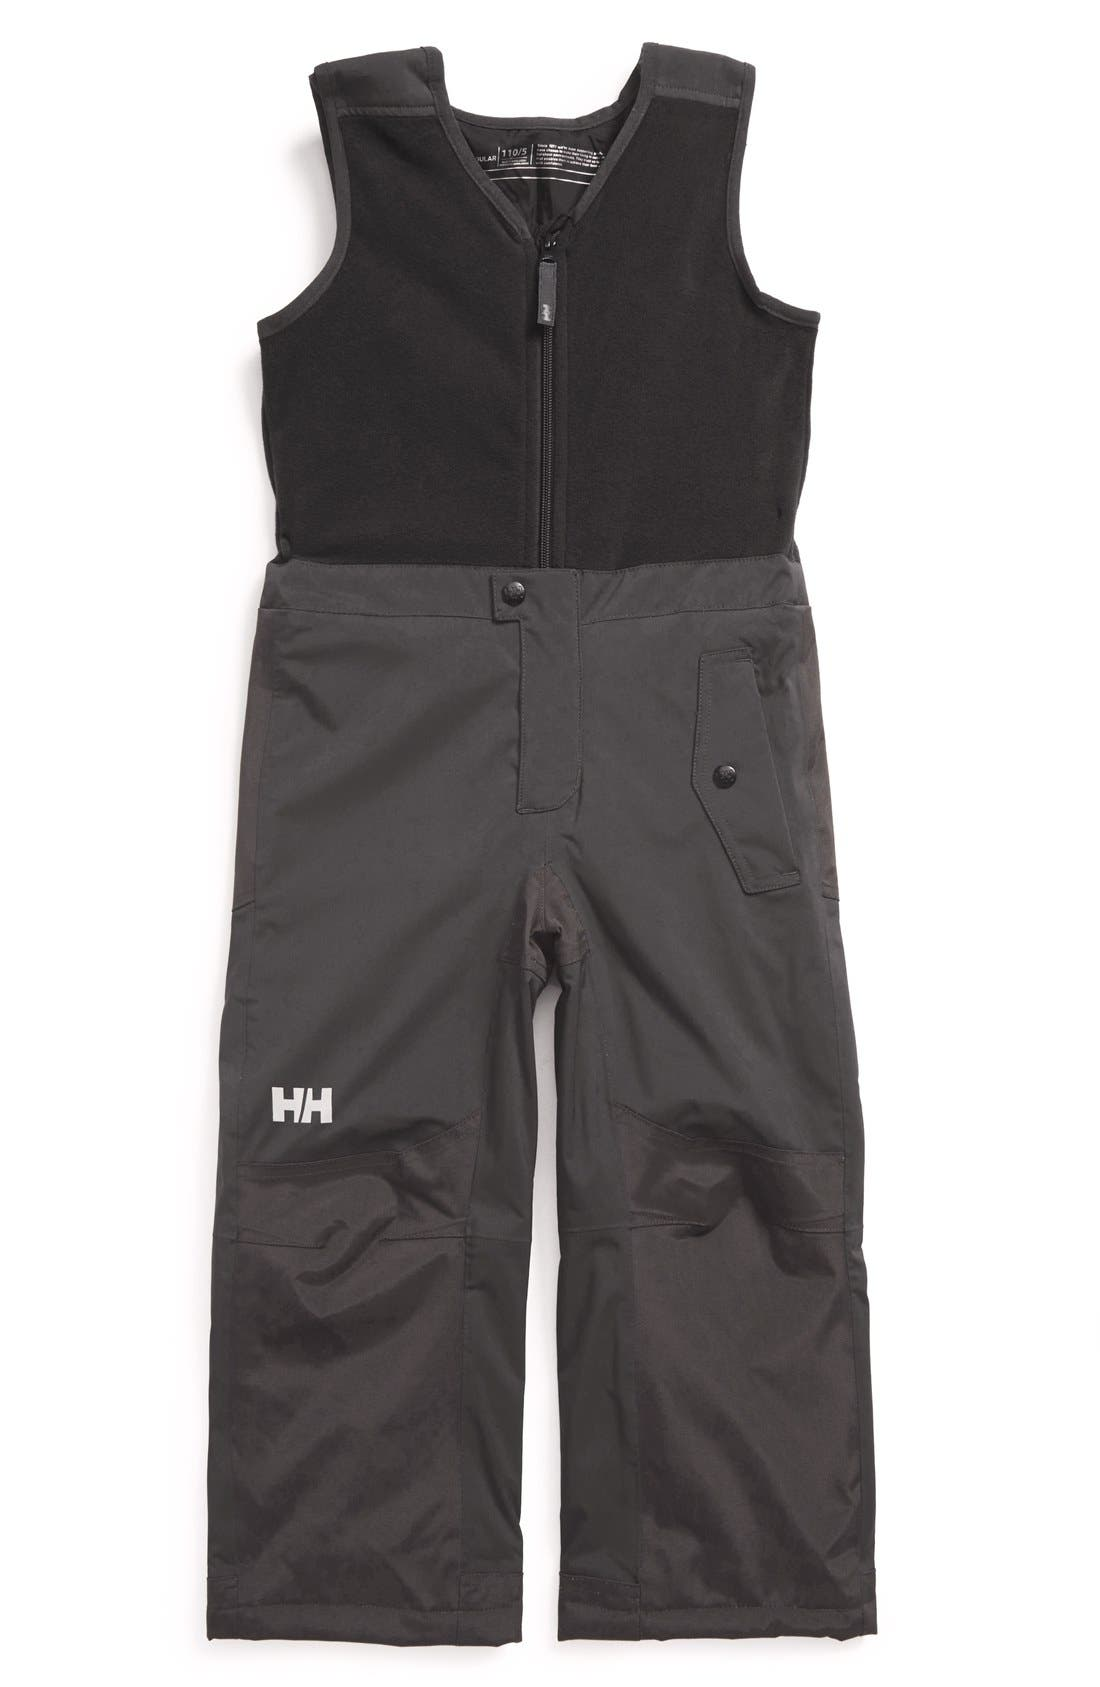 Main Image - HellyHansen 'K Powder' Insulated Bib(Toddler Boys & Little Boys)